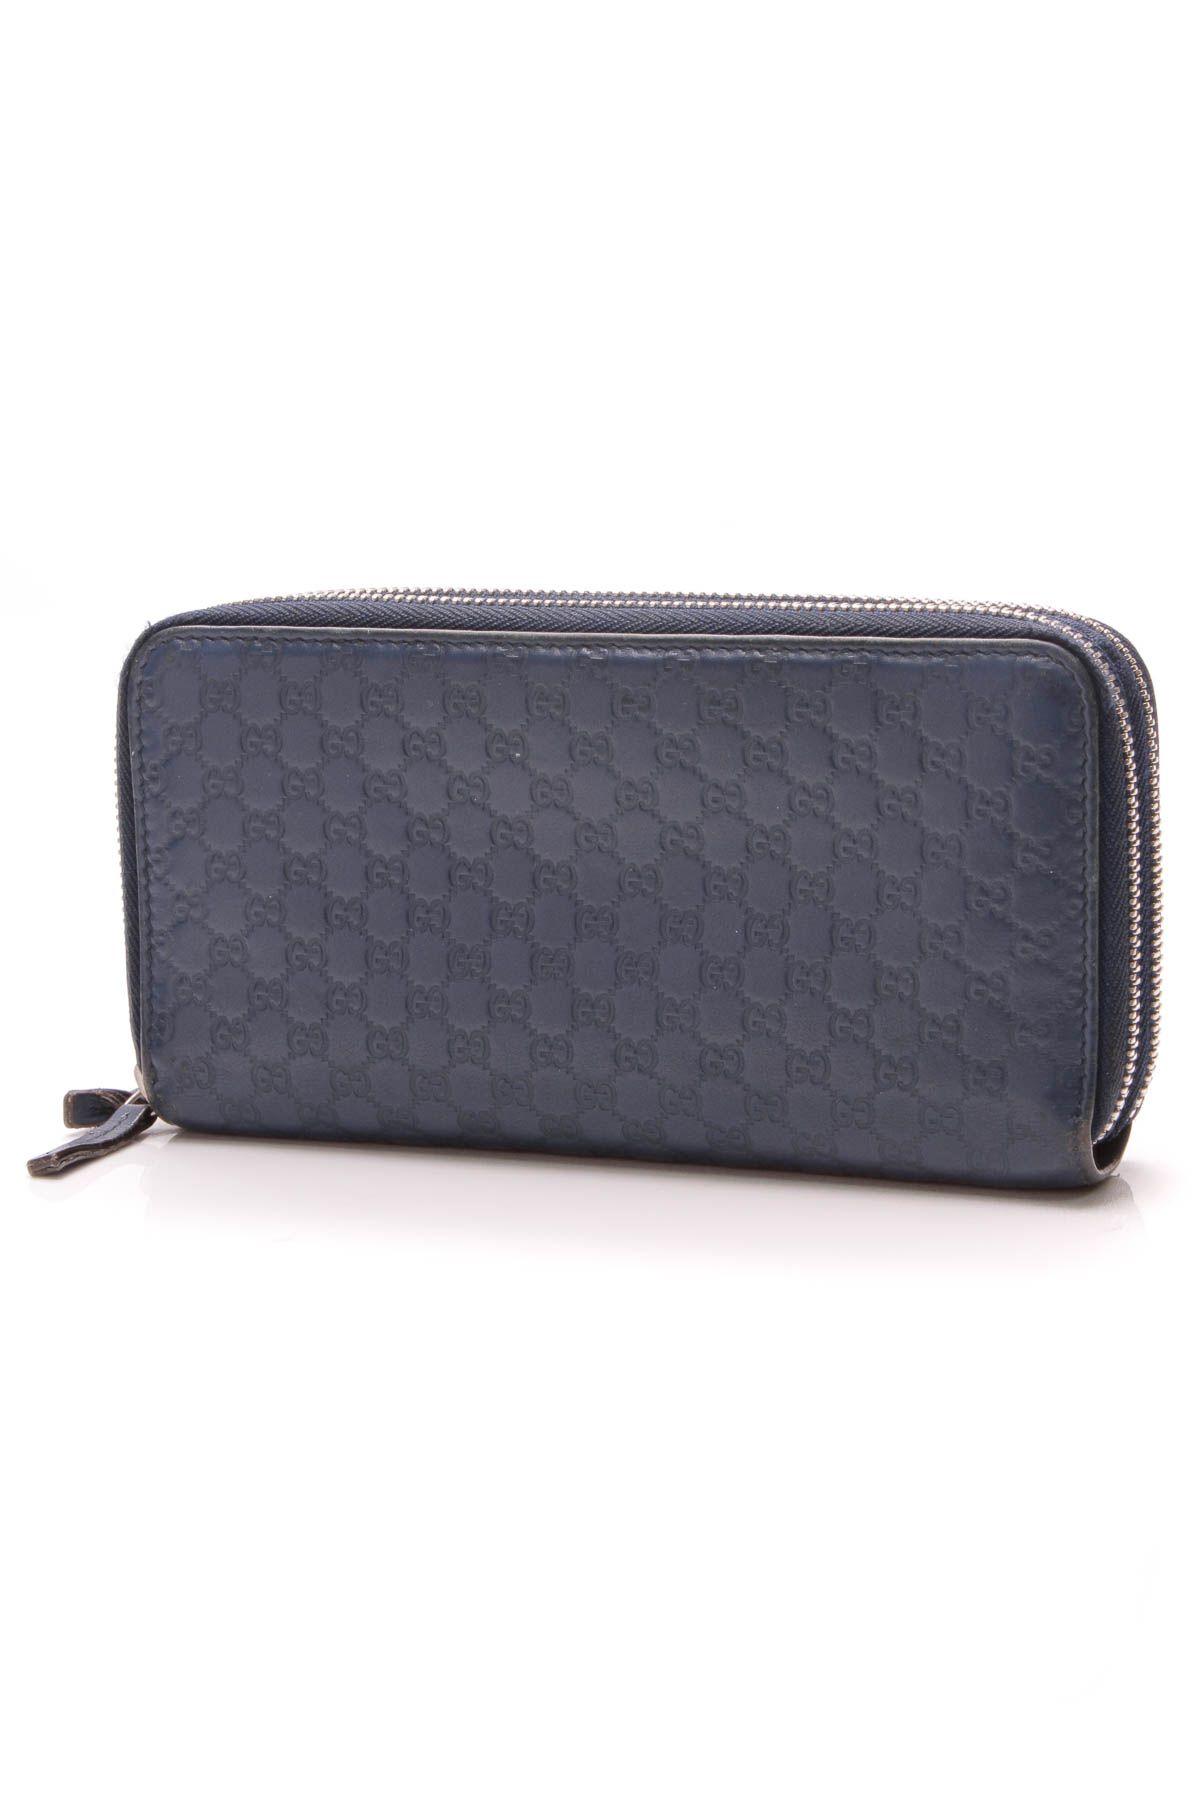 603ff63dc492 Double Zip Around Wallet - Microguccissima | Gucci Glam | Zip around ...